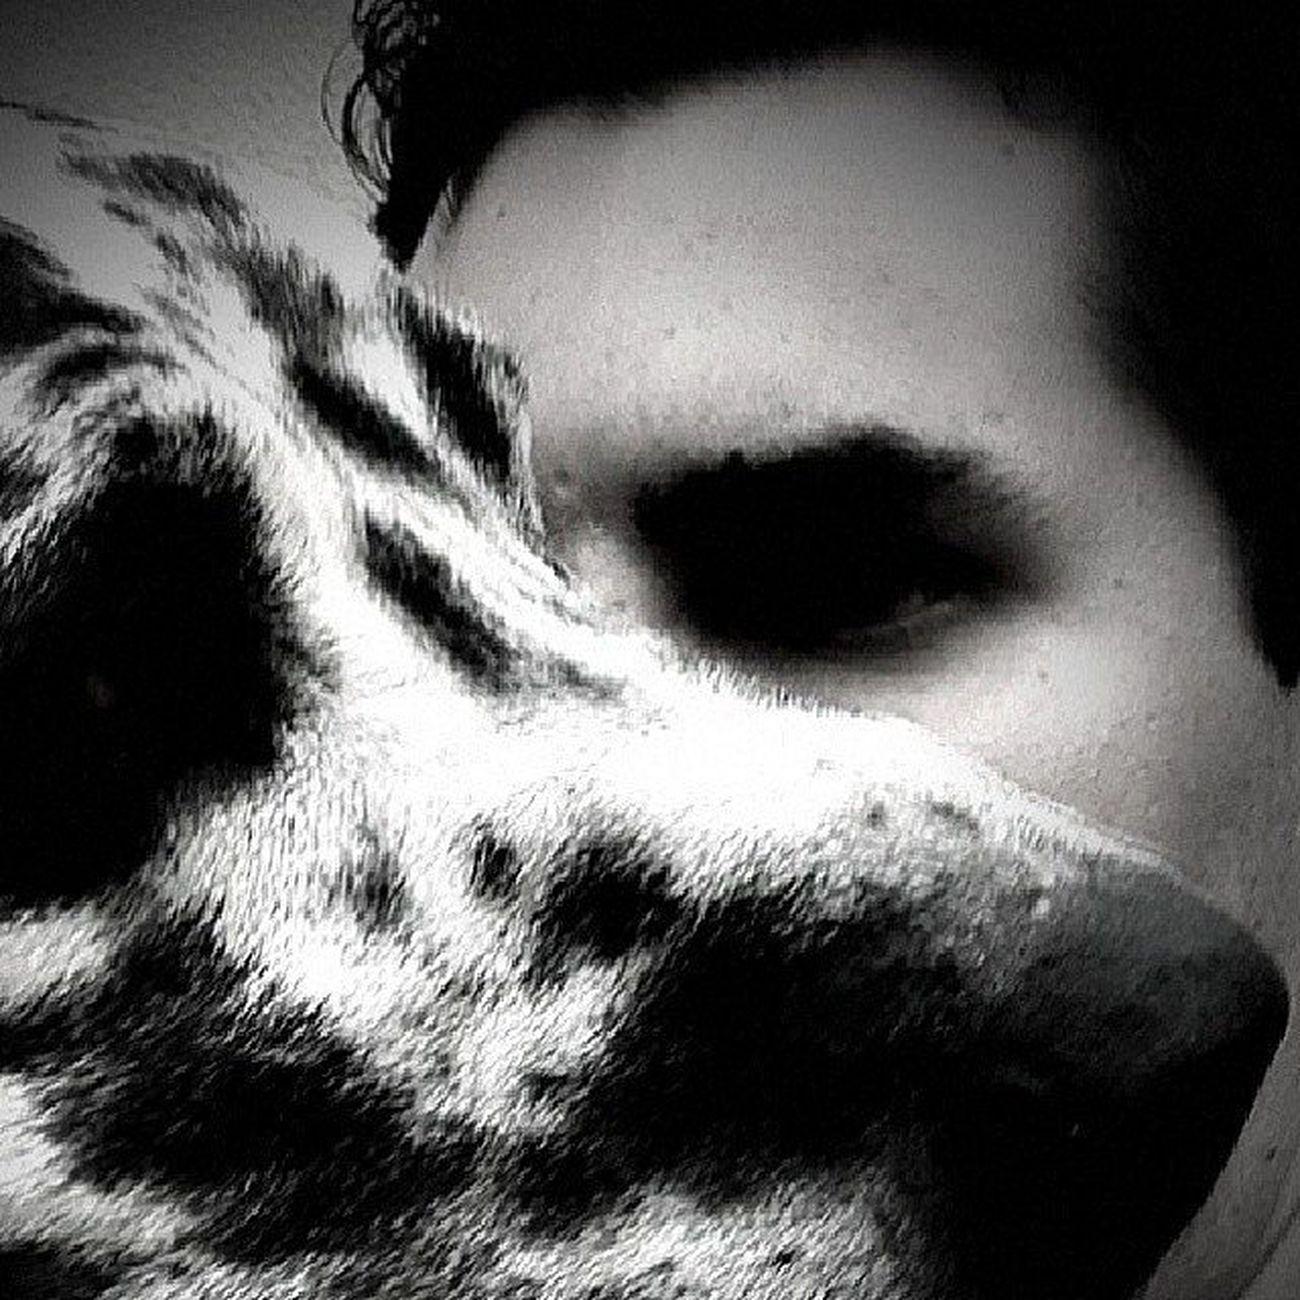 Dogselfie Dog Mydog Mypet Dogalemao Arlequim Pretoebranco Ozzy Friends Bestfriends Brasil Saopaulo SP Aldeiadaserra Gopro Goproselfieguy Selfiegopro Goproerman Instagopro Goprouniverse Goprobrsl Goprobr Goprocle Selfiegoproheros Familiagopro_ hero3 euamogopro actioncam actioncambrasil